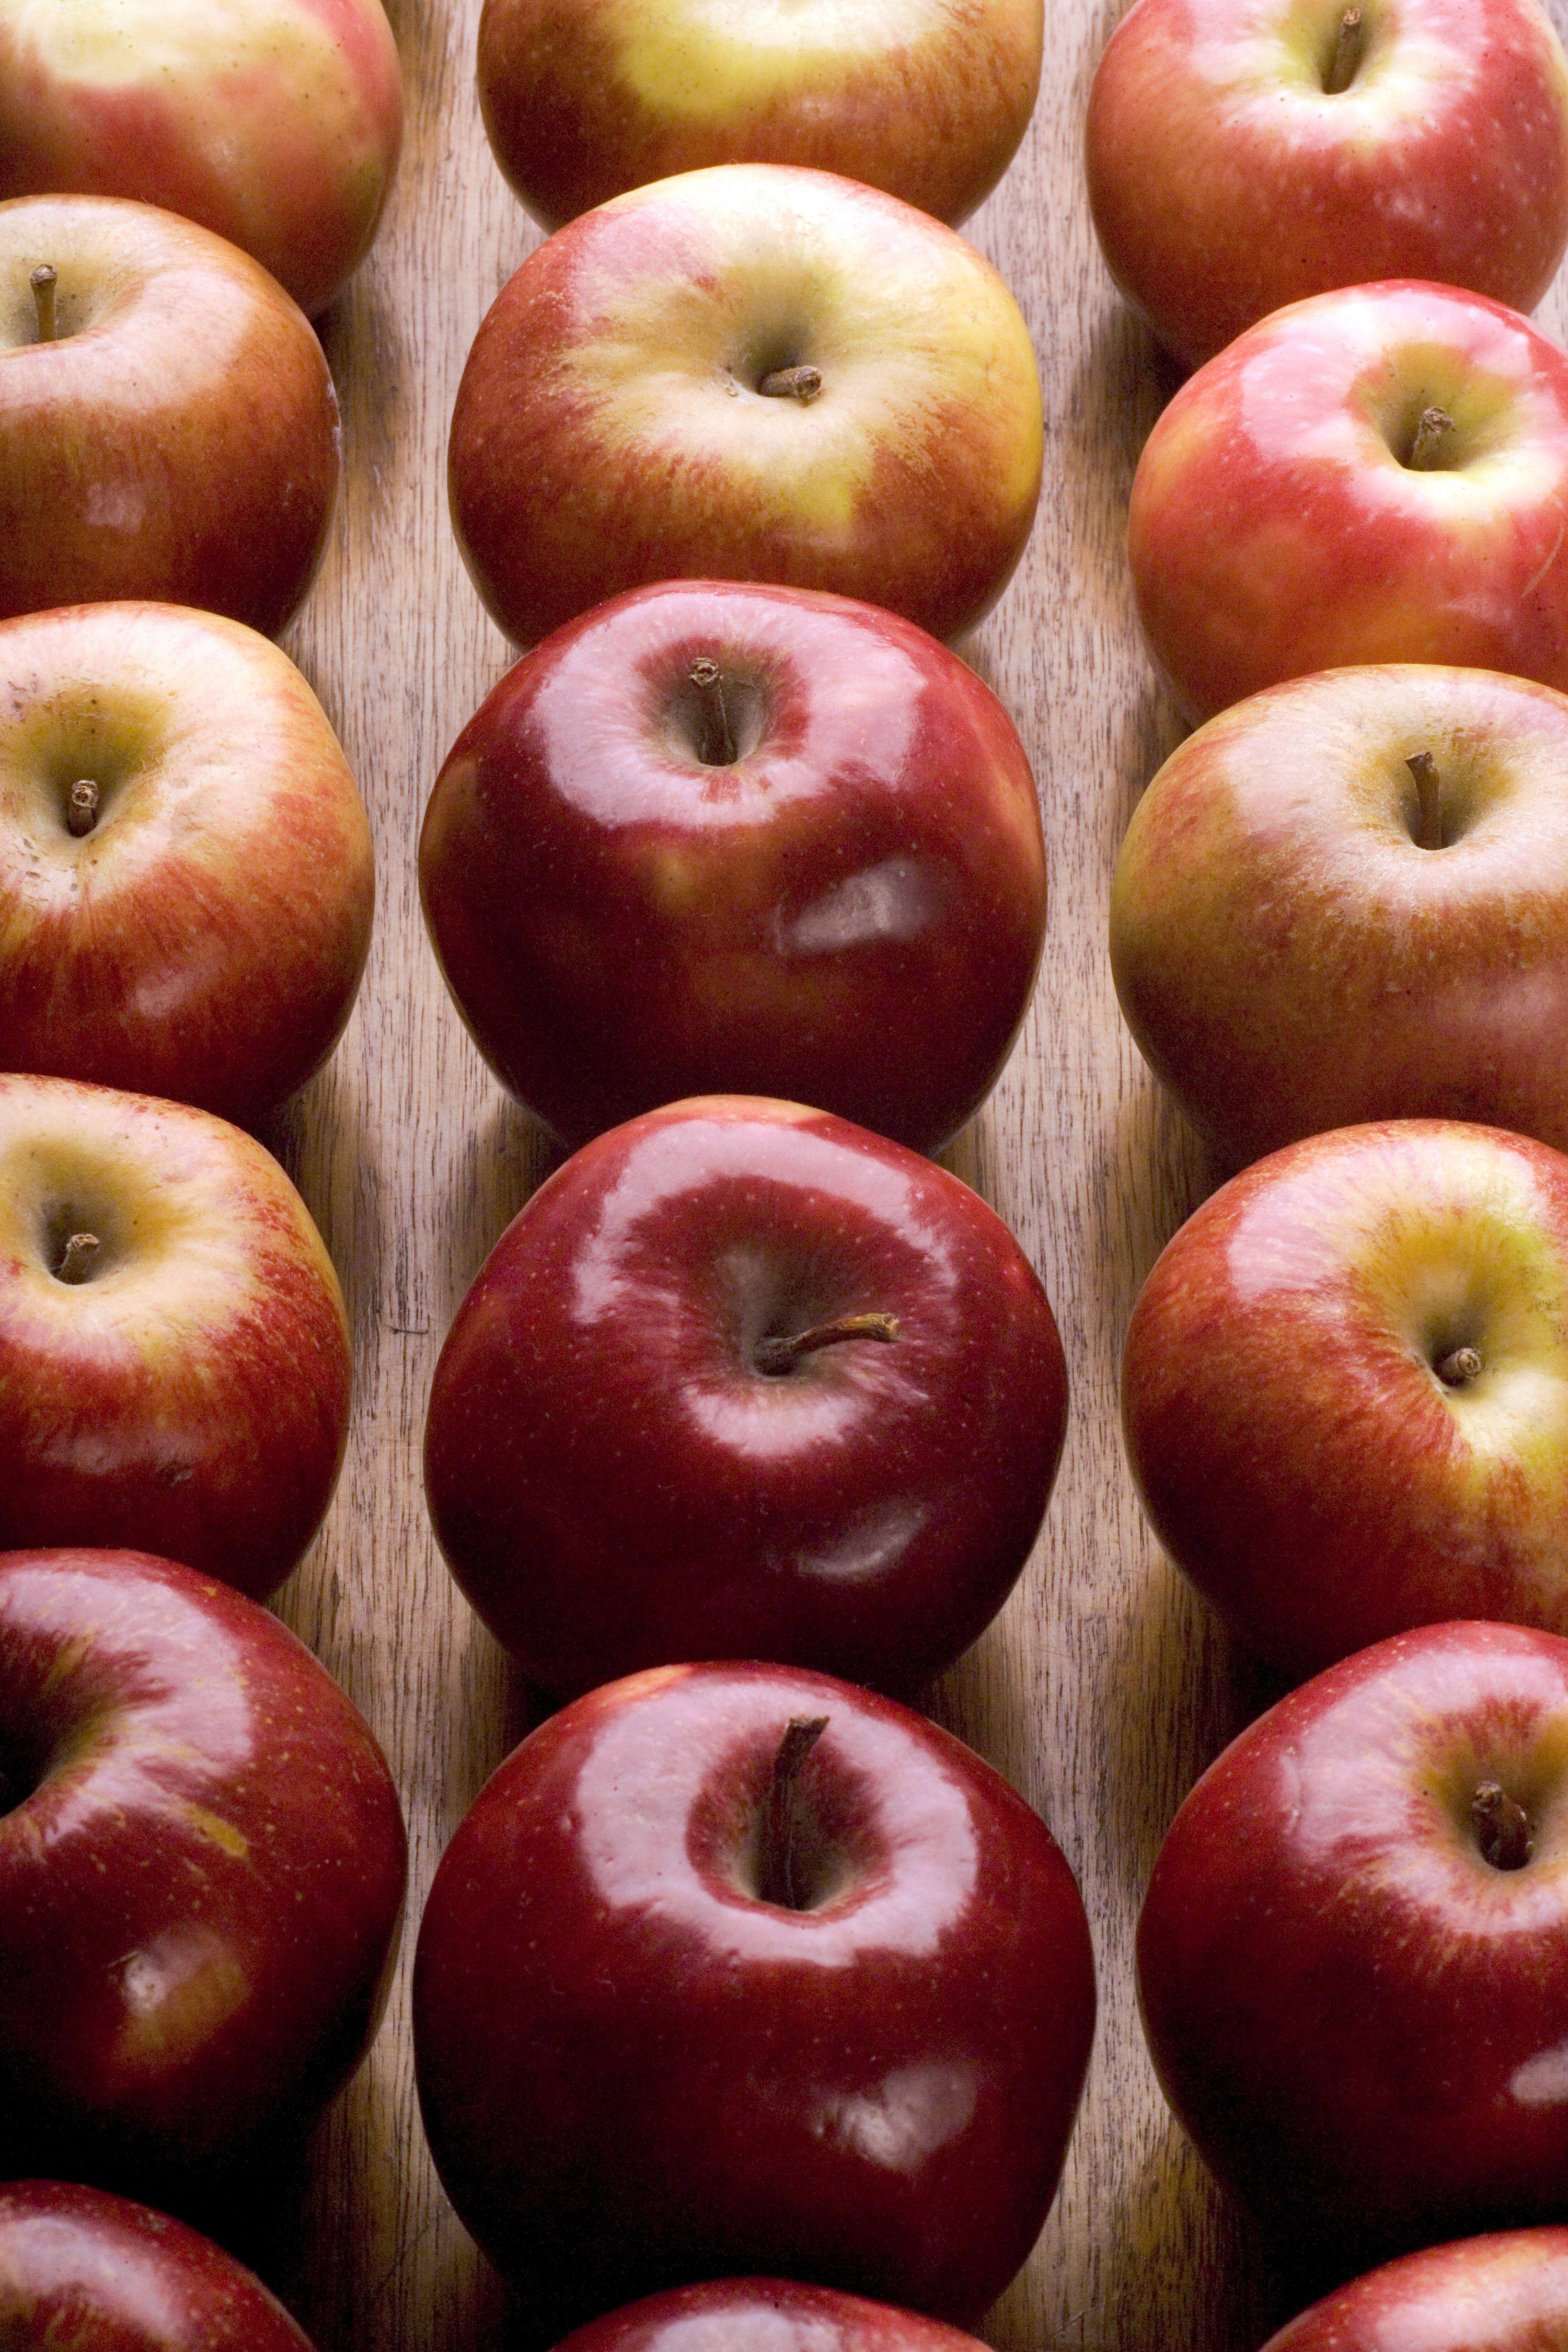 Fiber in one apple